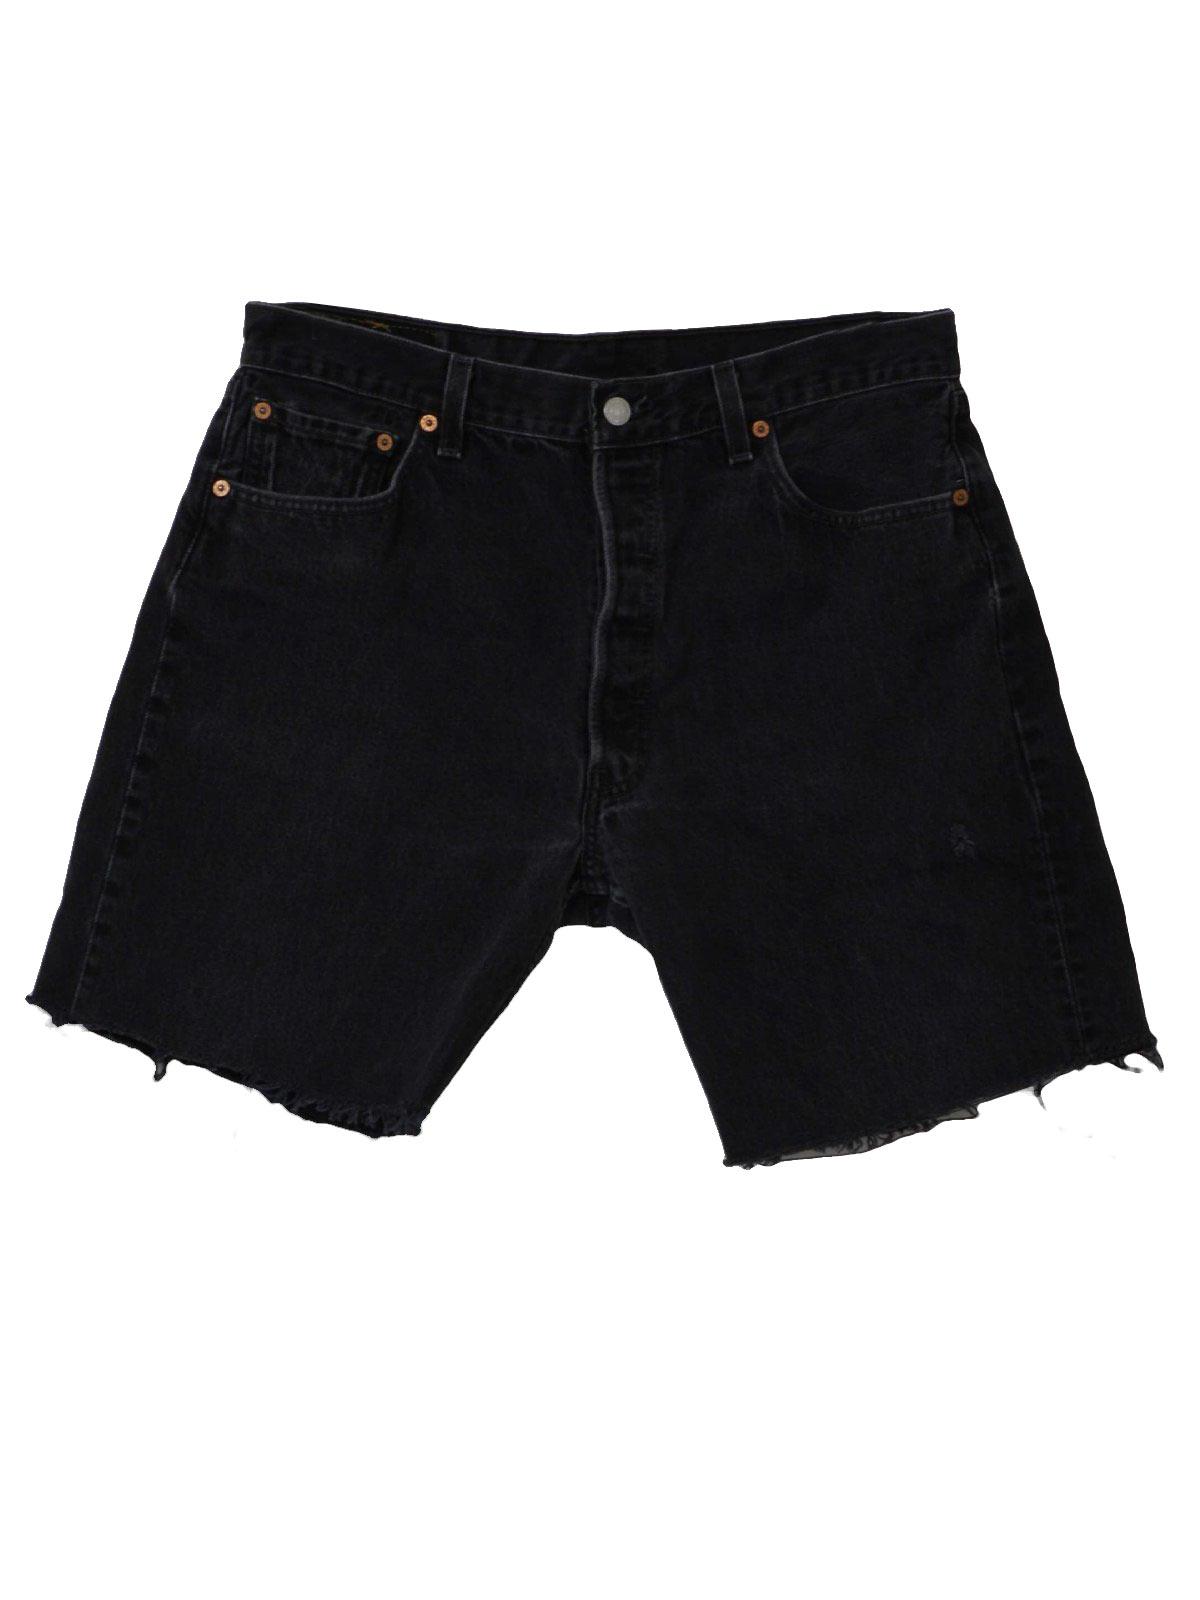 Mens black denim jean shorts – Your new jeans photo blog